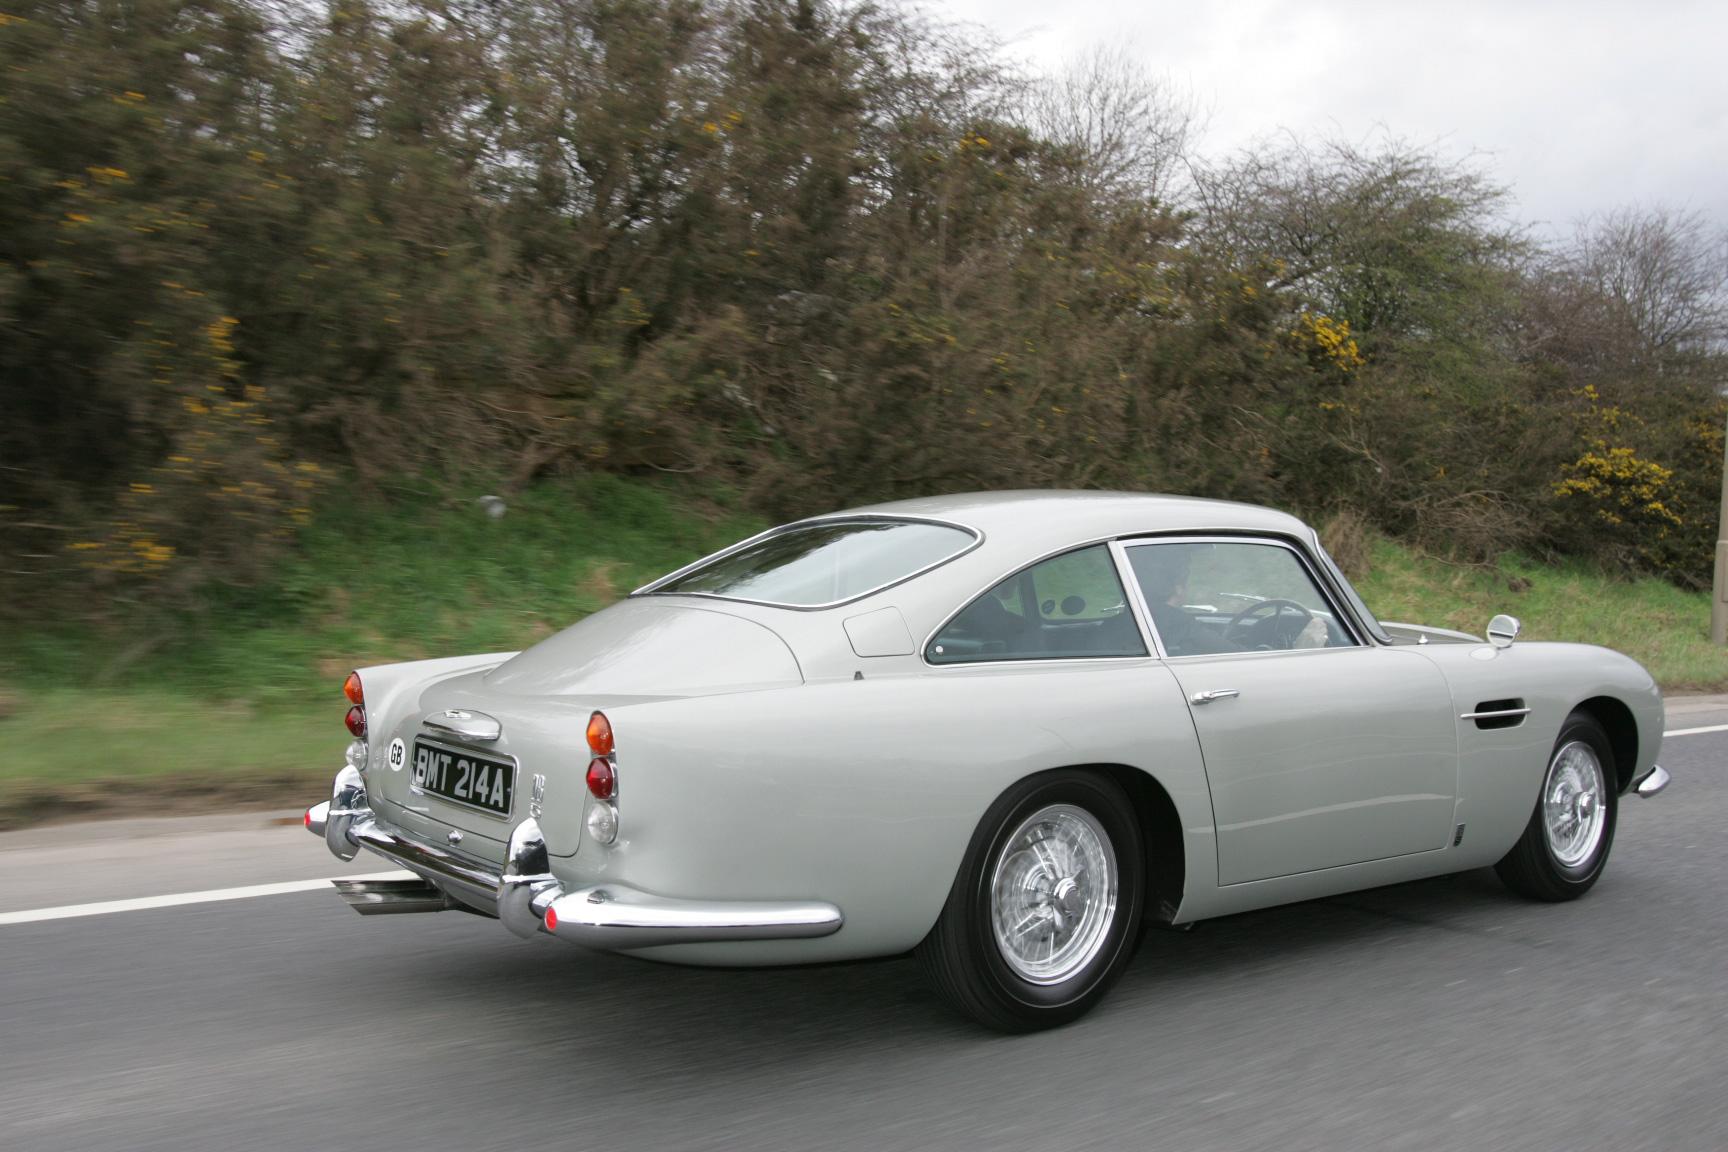 1965 Aston Martin DB5 Moving Rear Photo